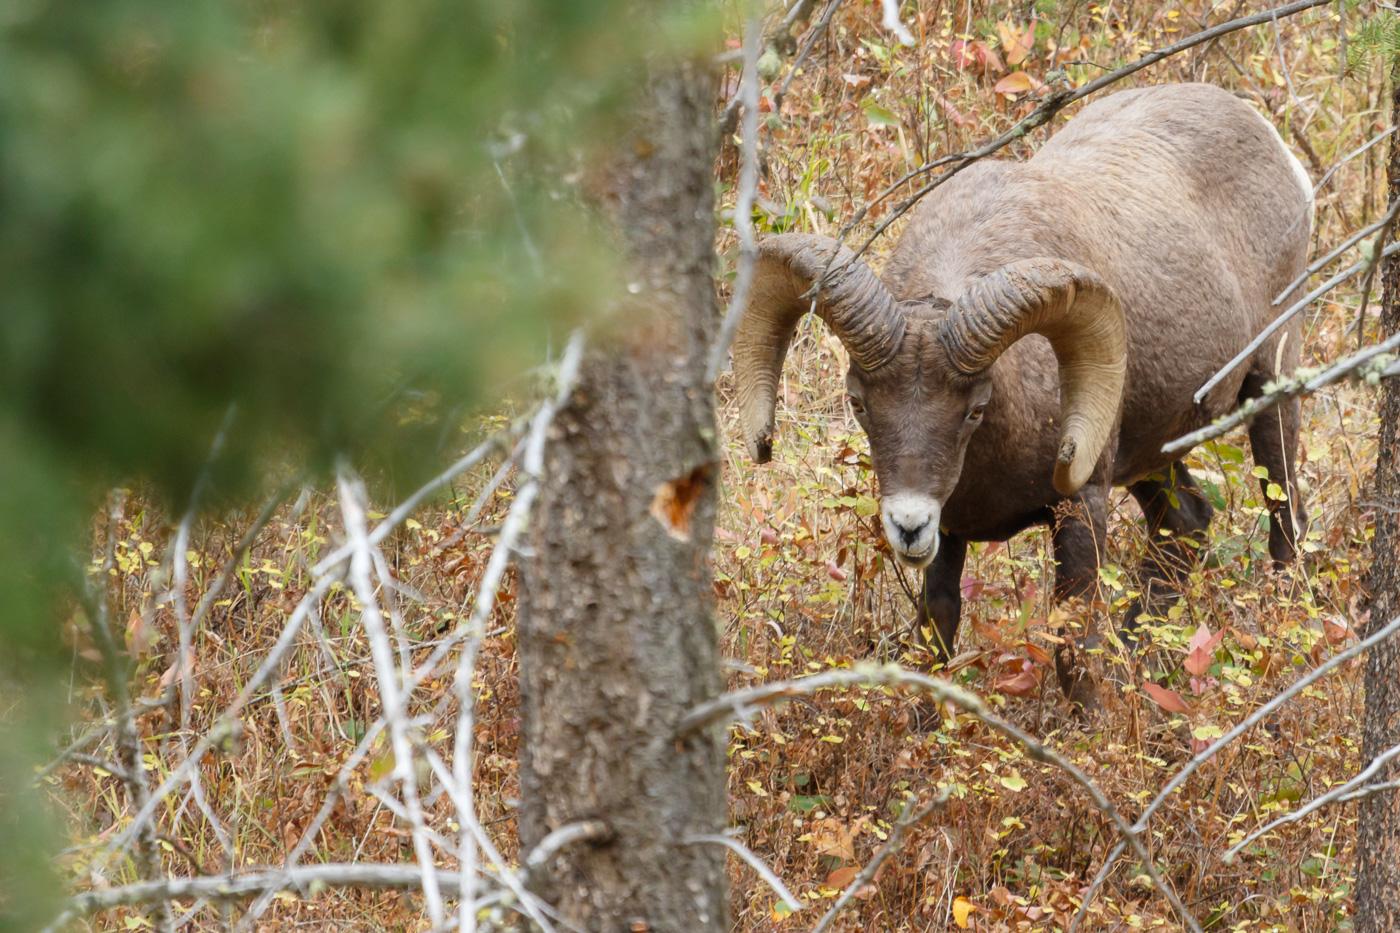 Bighorn sheep (Ovis canadensis), Yellowstone National Park, U.S.A. - Fauna de Nord-Amèrica - Raül Carmona - Fotografia, Fotografia d'estudi, esdeveniments i Natura